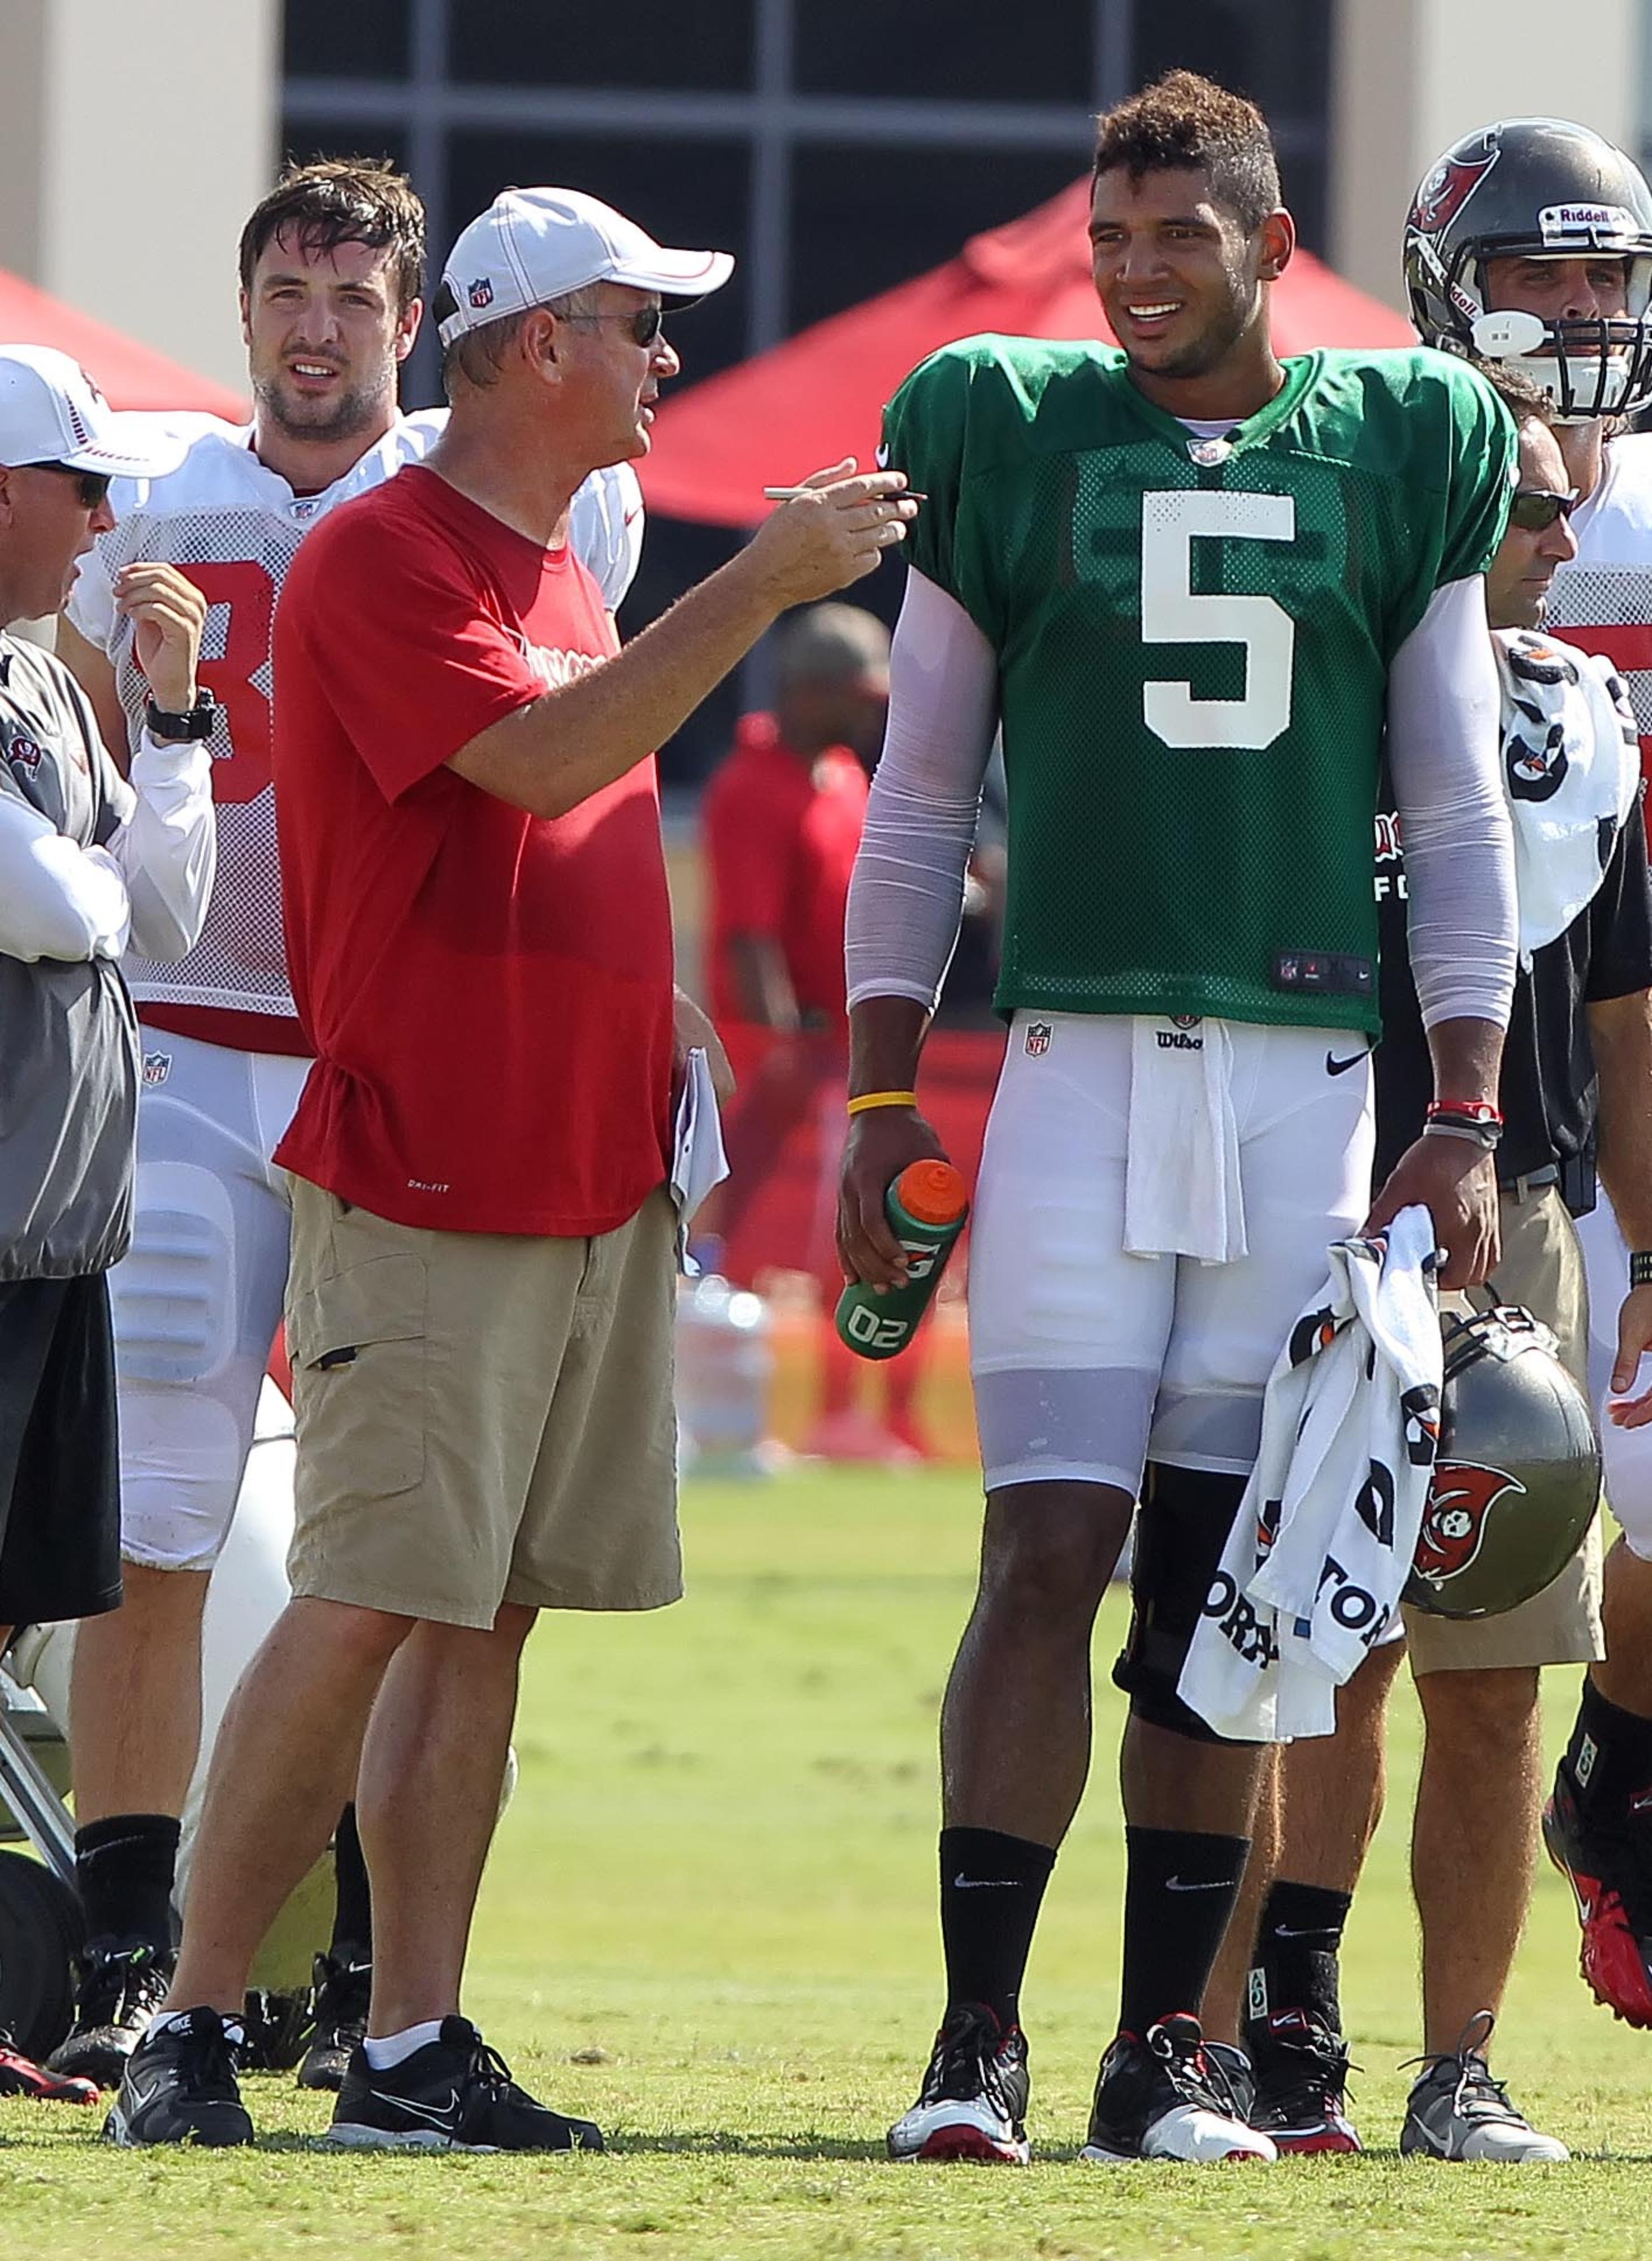 August 3, 2012; Tampa, FL, USA;  Tampa Bay Buccaneers quarterback Josh Freeman (5) talks with quarterback coach Ron Turner during training camp at One Buc Place. Mandatory Credit: Kim Klement-US PRESSWIRE